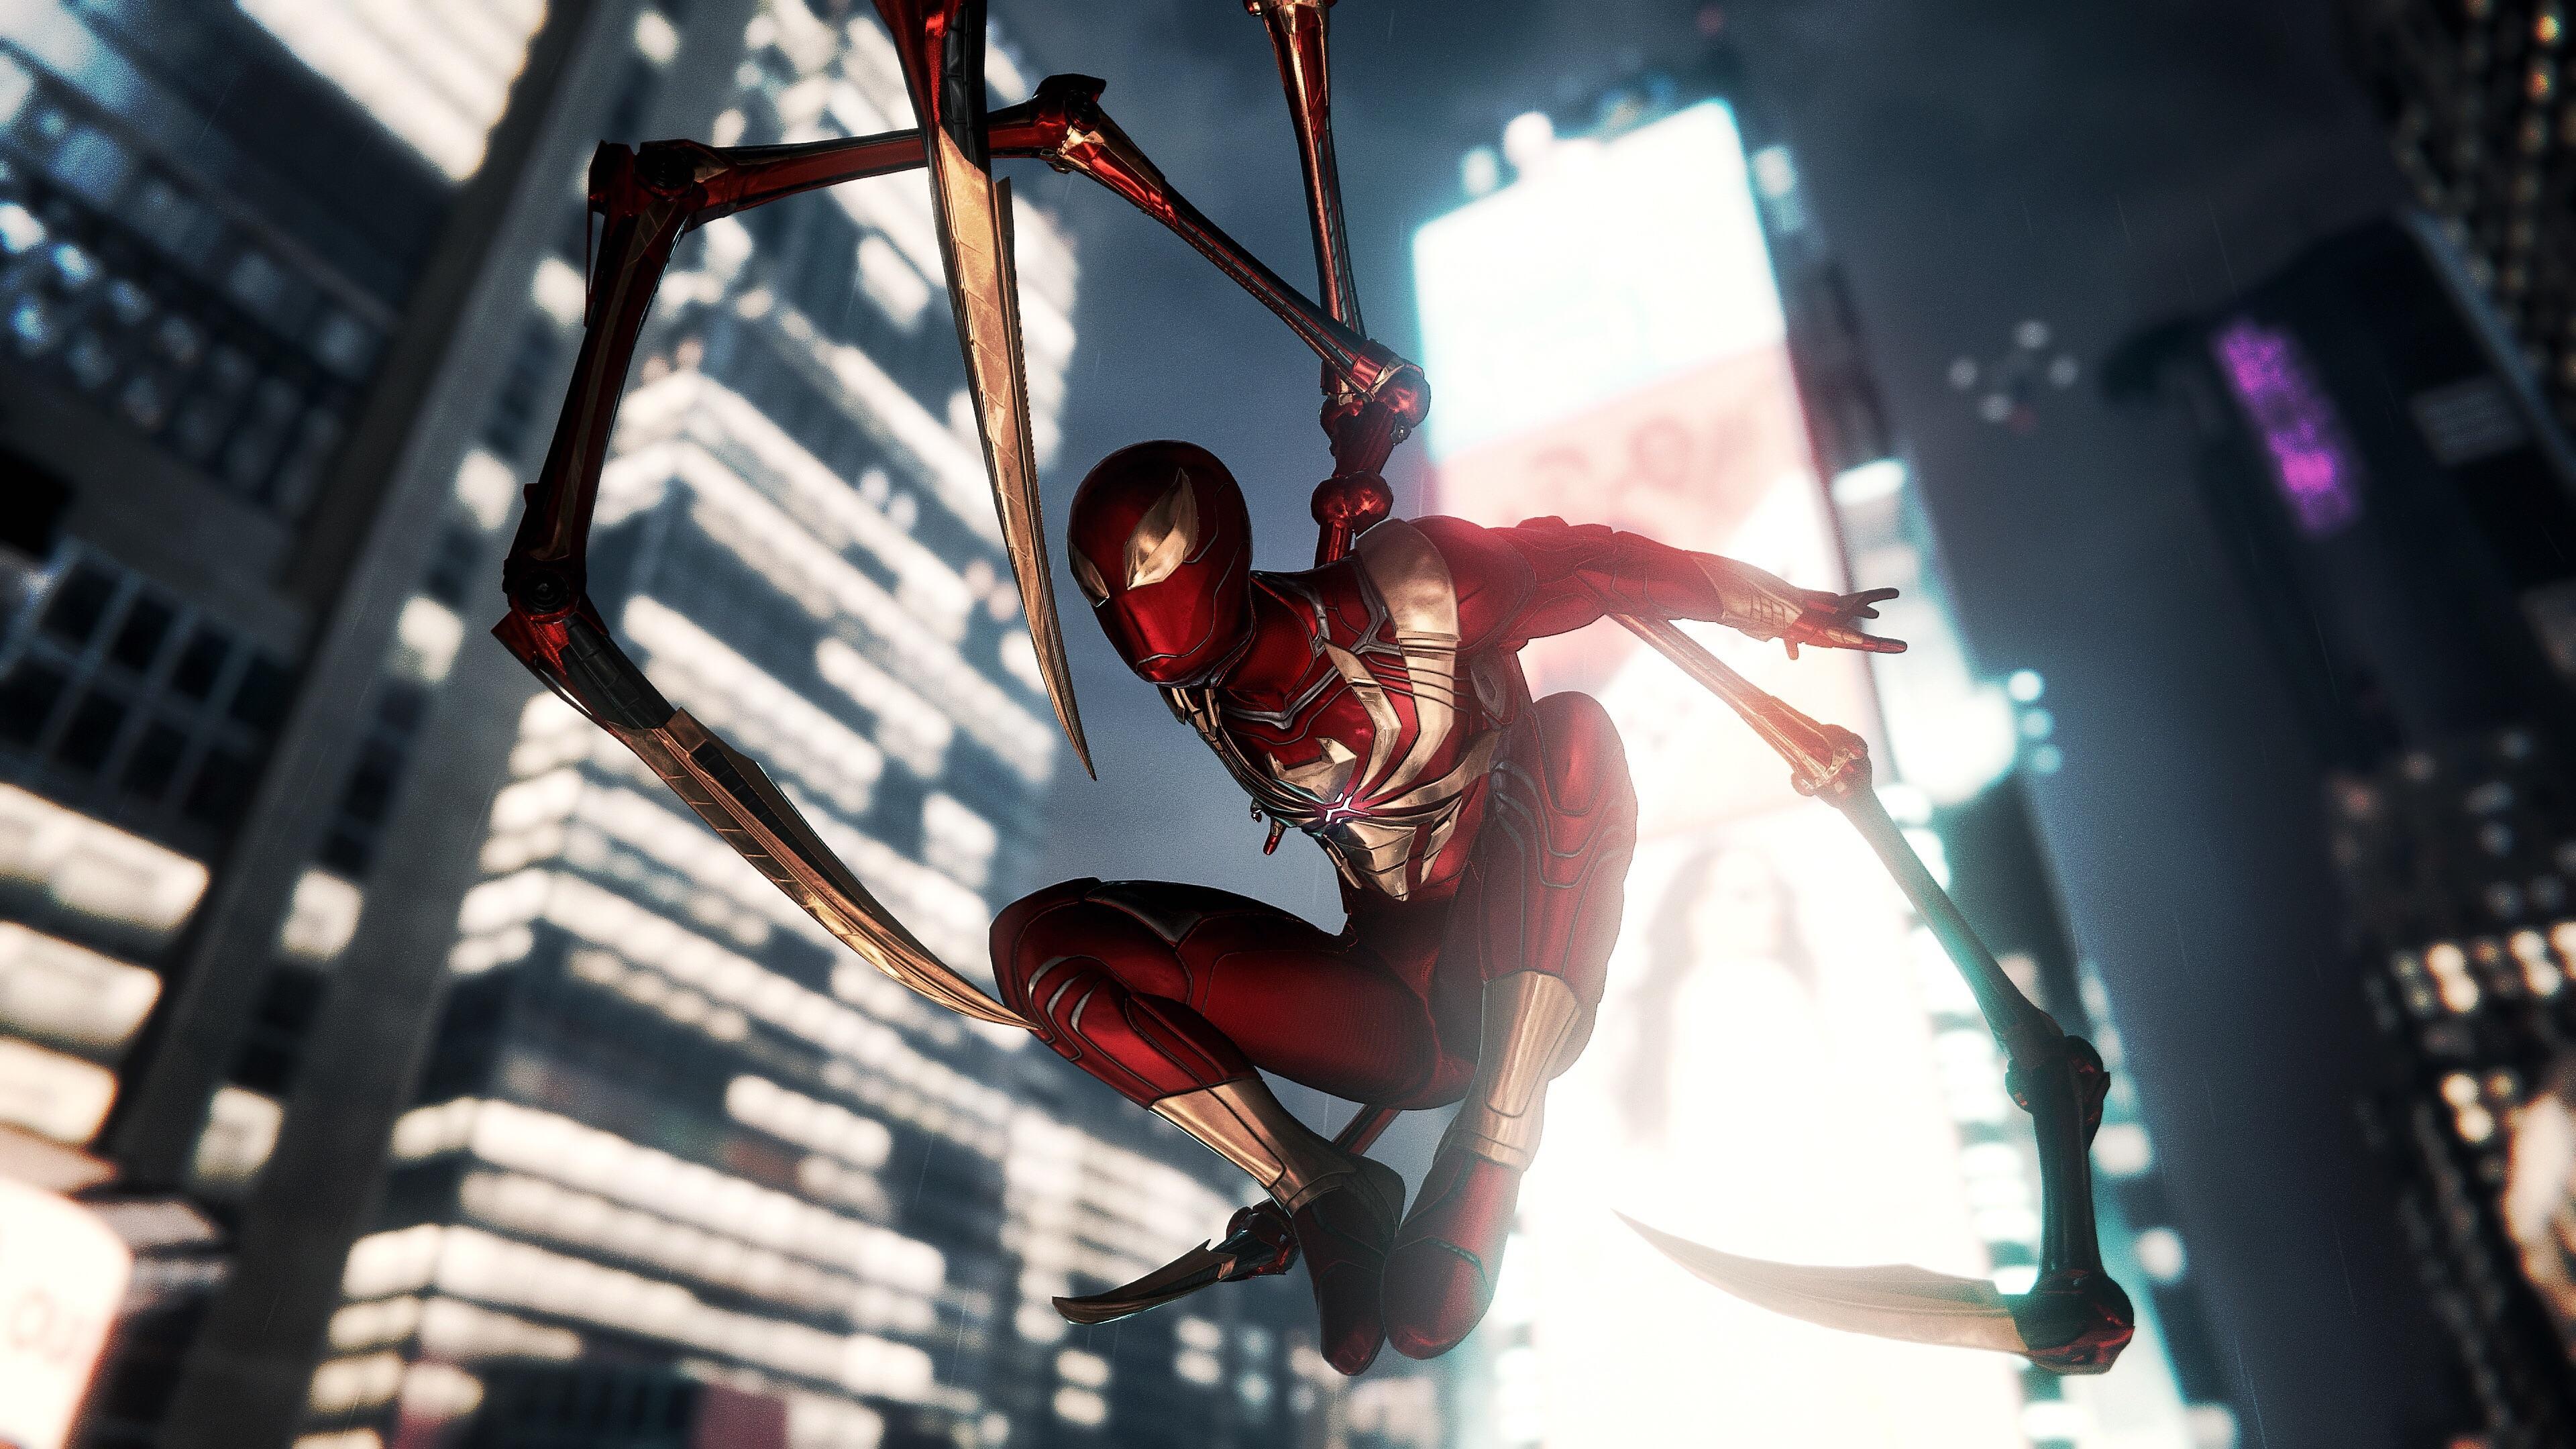 Wallpaper 4k Spiderman Suit Ps4 2018 games wallpapers, 4k-wallpapers